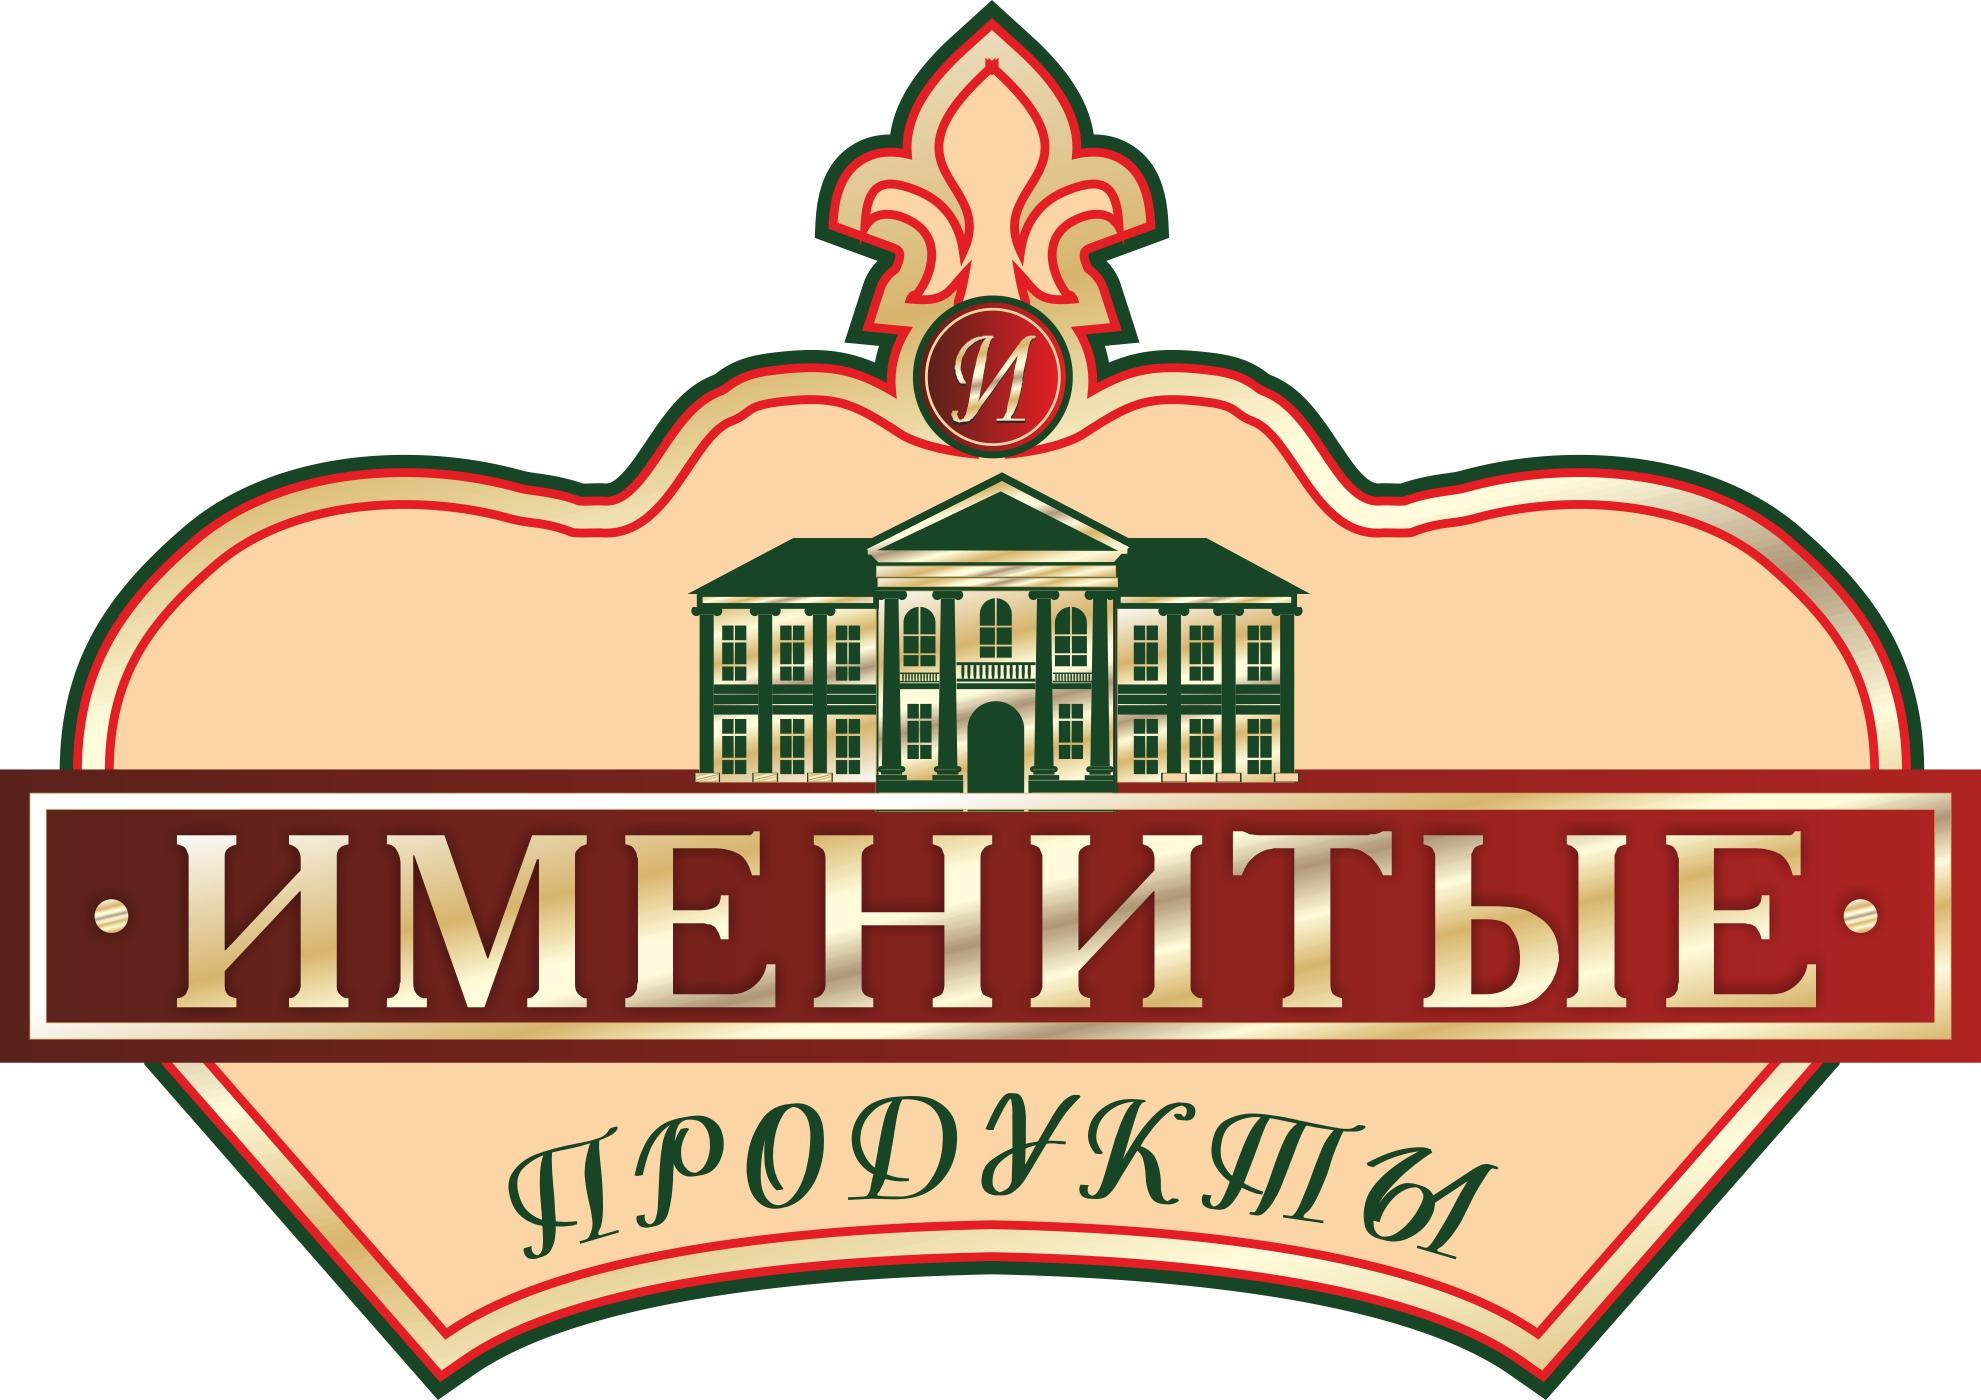 Логотип и фирменный стиль продуктов питания фото f_2785bb753dac022e.jpg